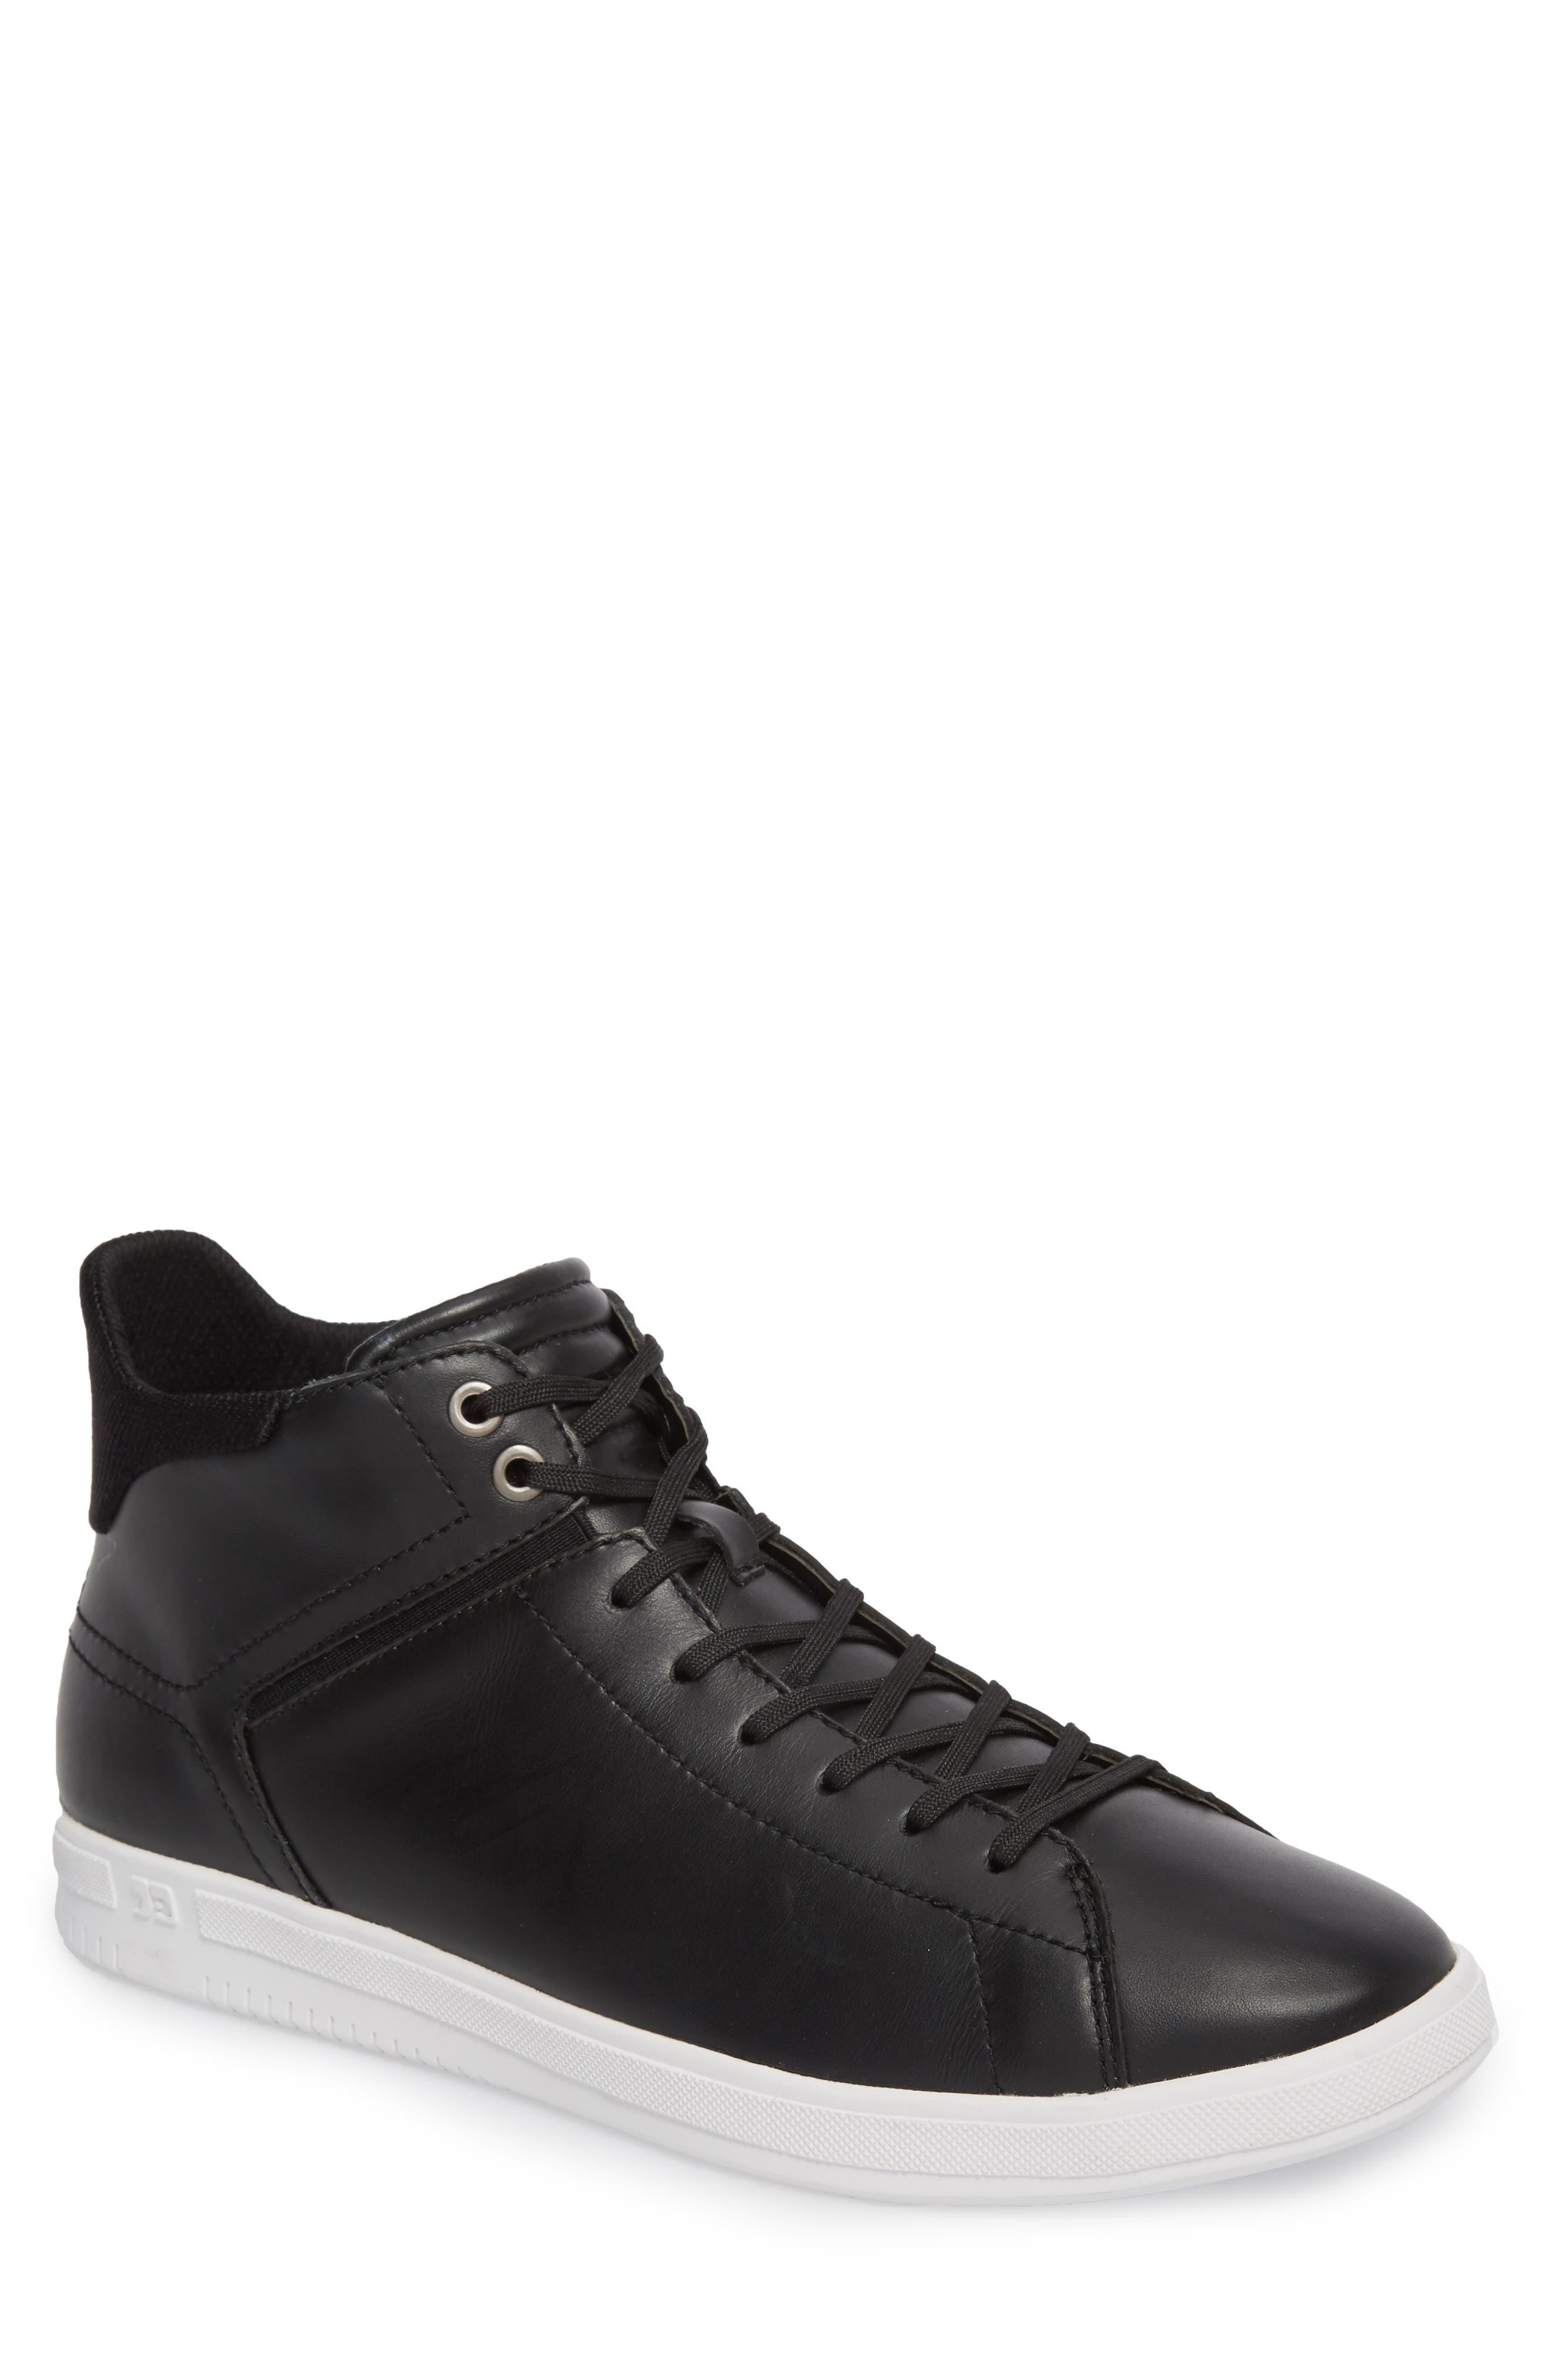 Joe Z Mid Top Sneaker,                         Main,                         color, Black Leather